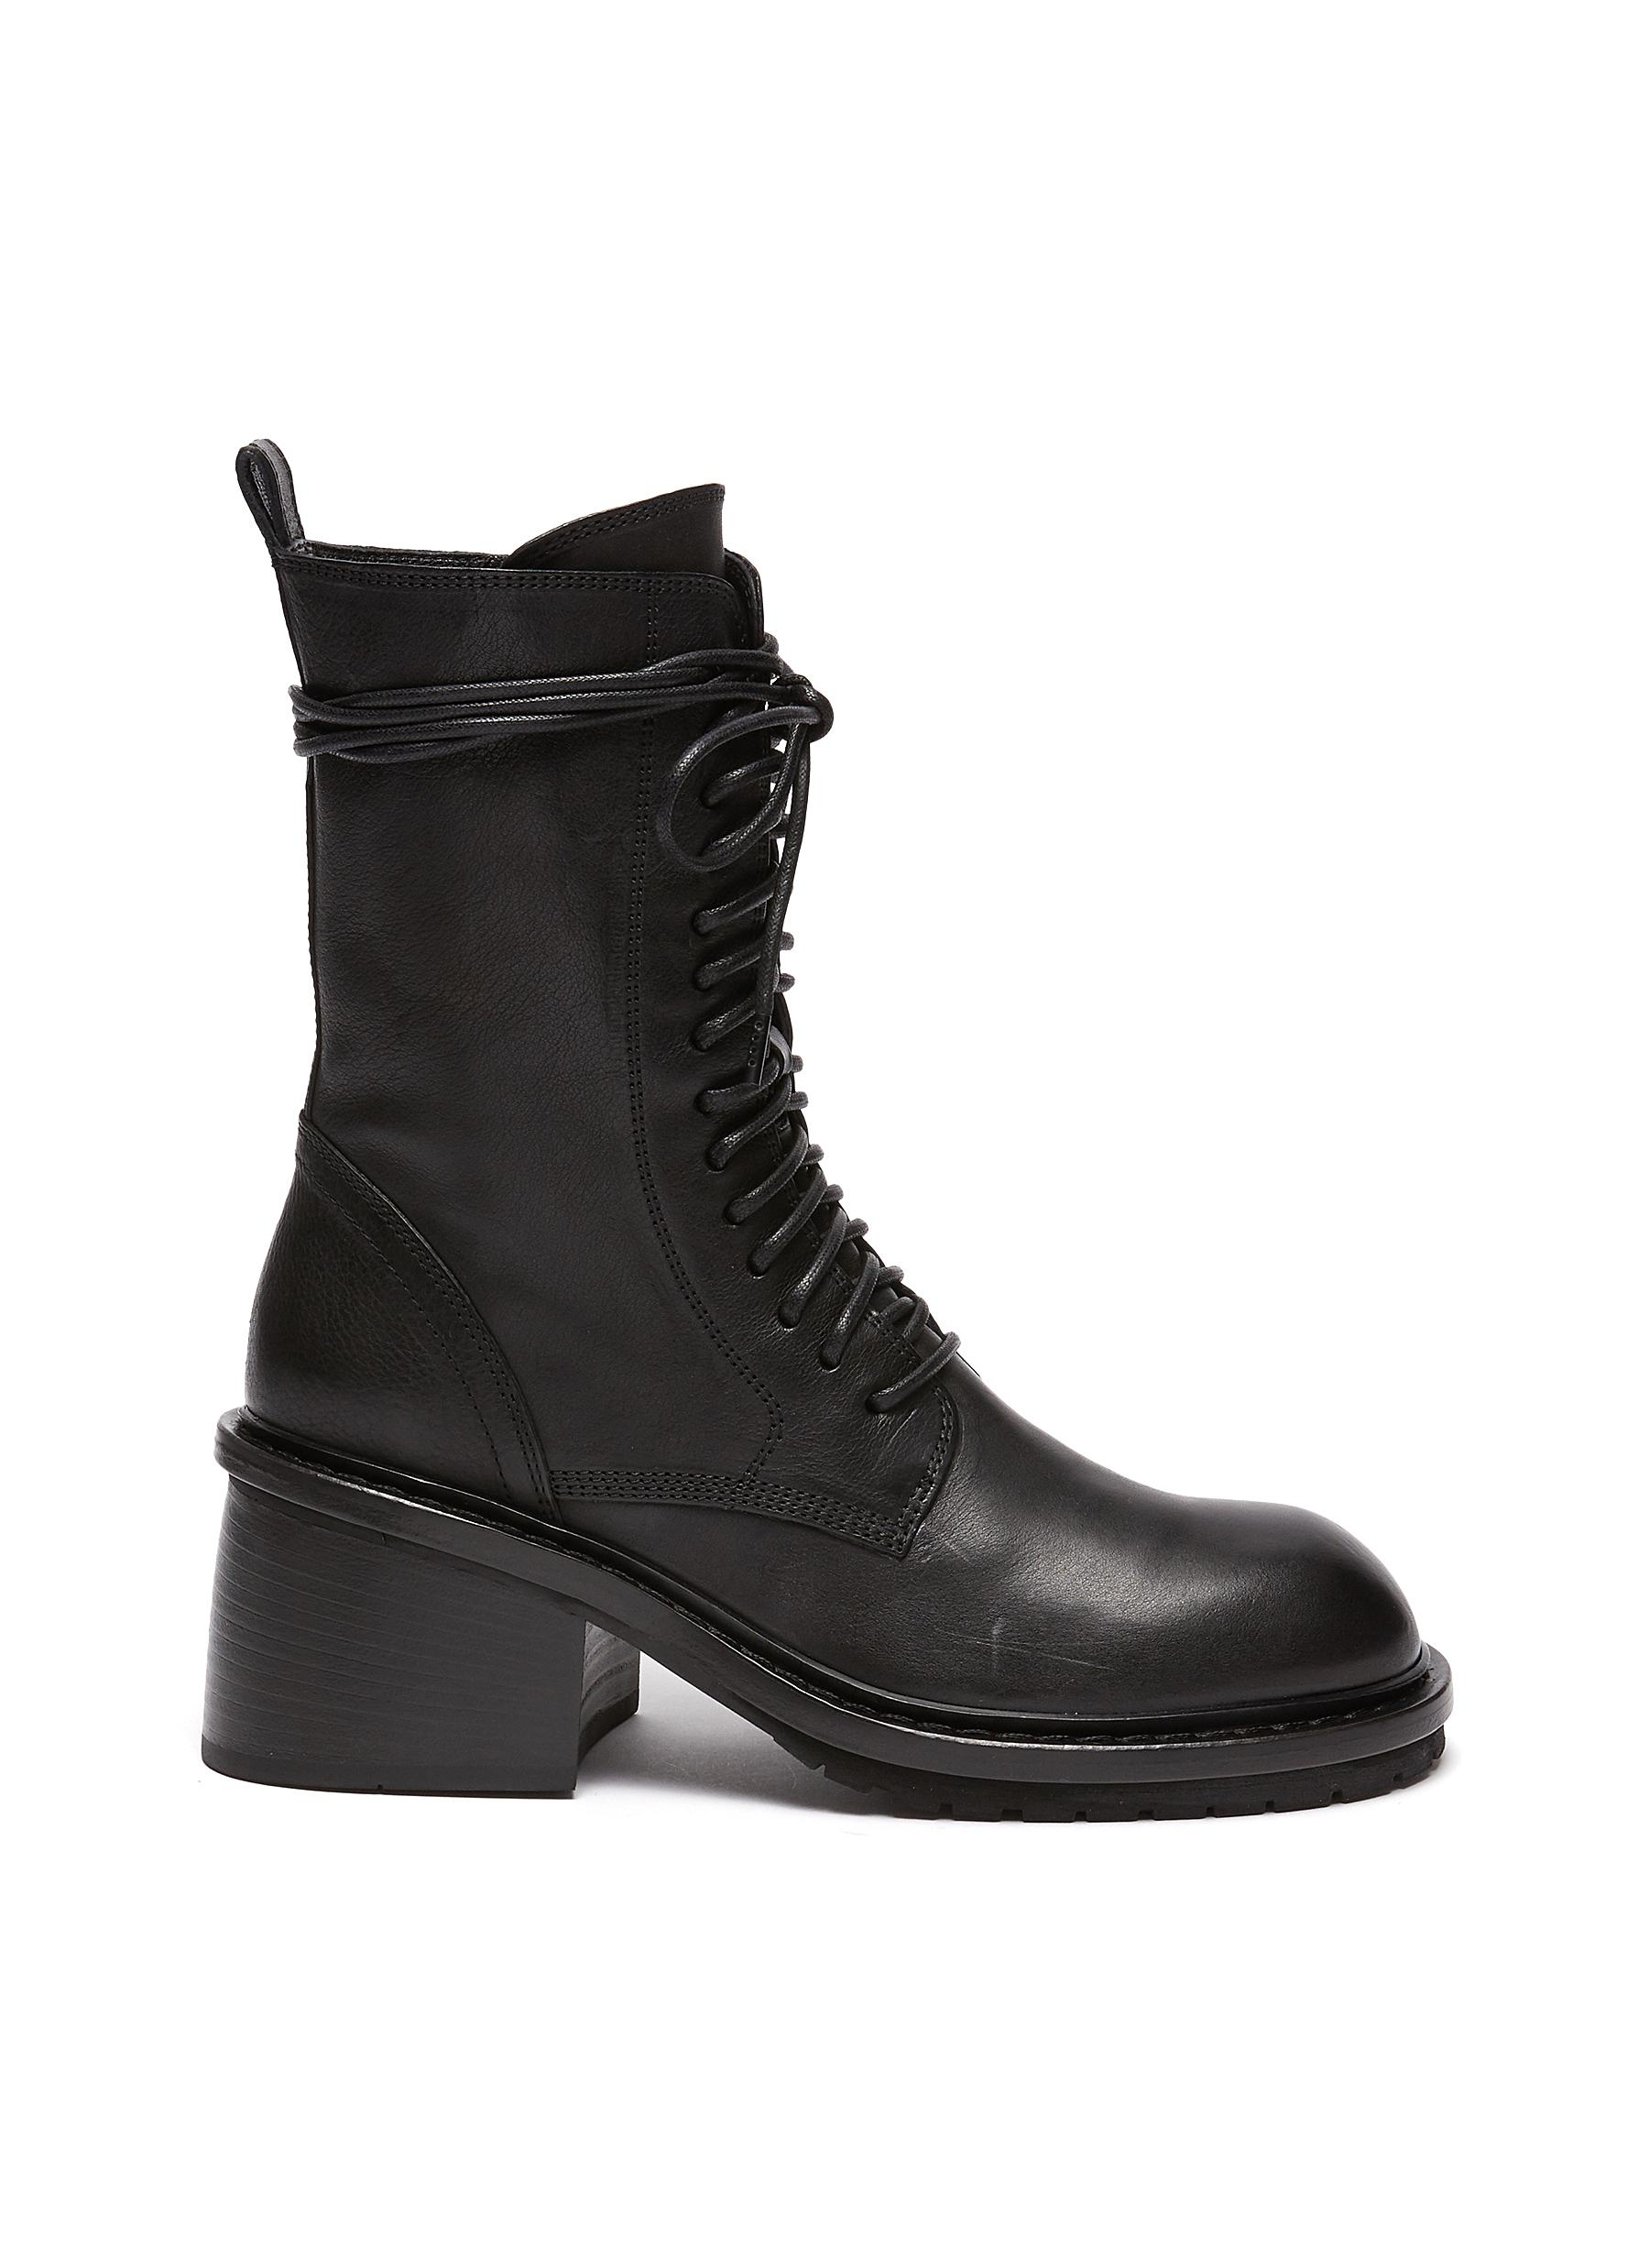 Block heel leather combat boots - ANN DEMEULEMEESTER - Modalova